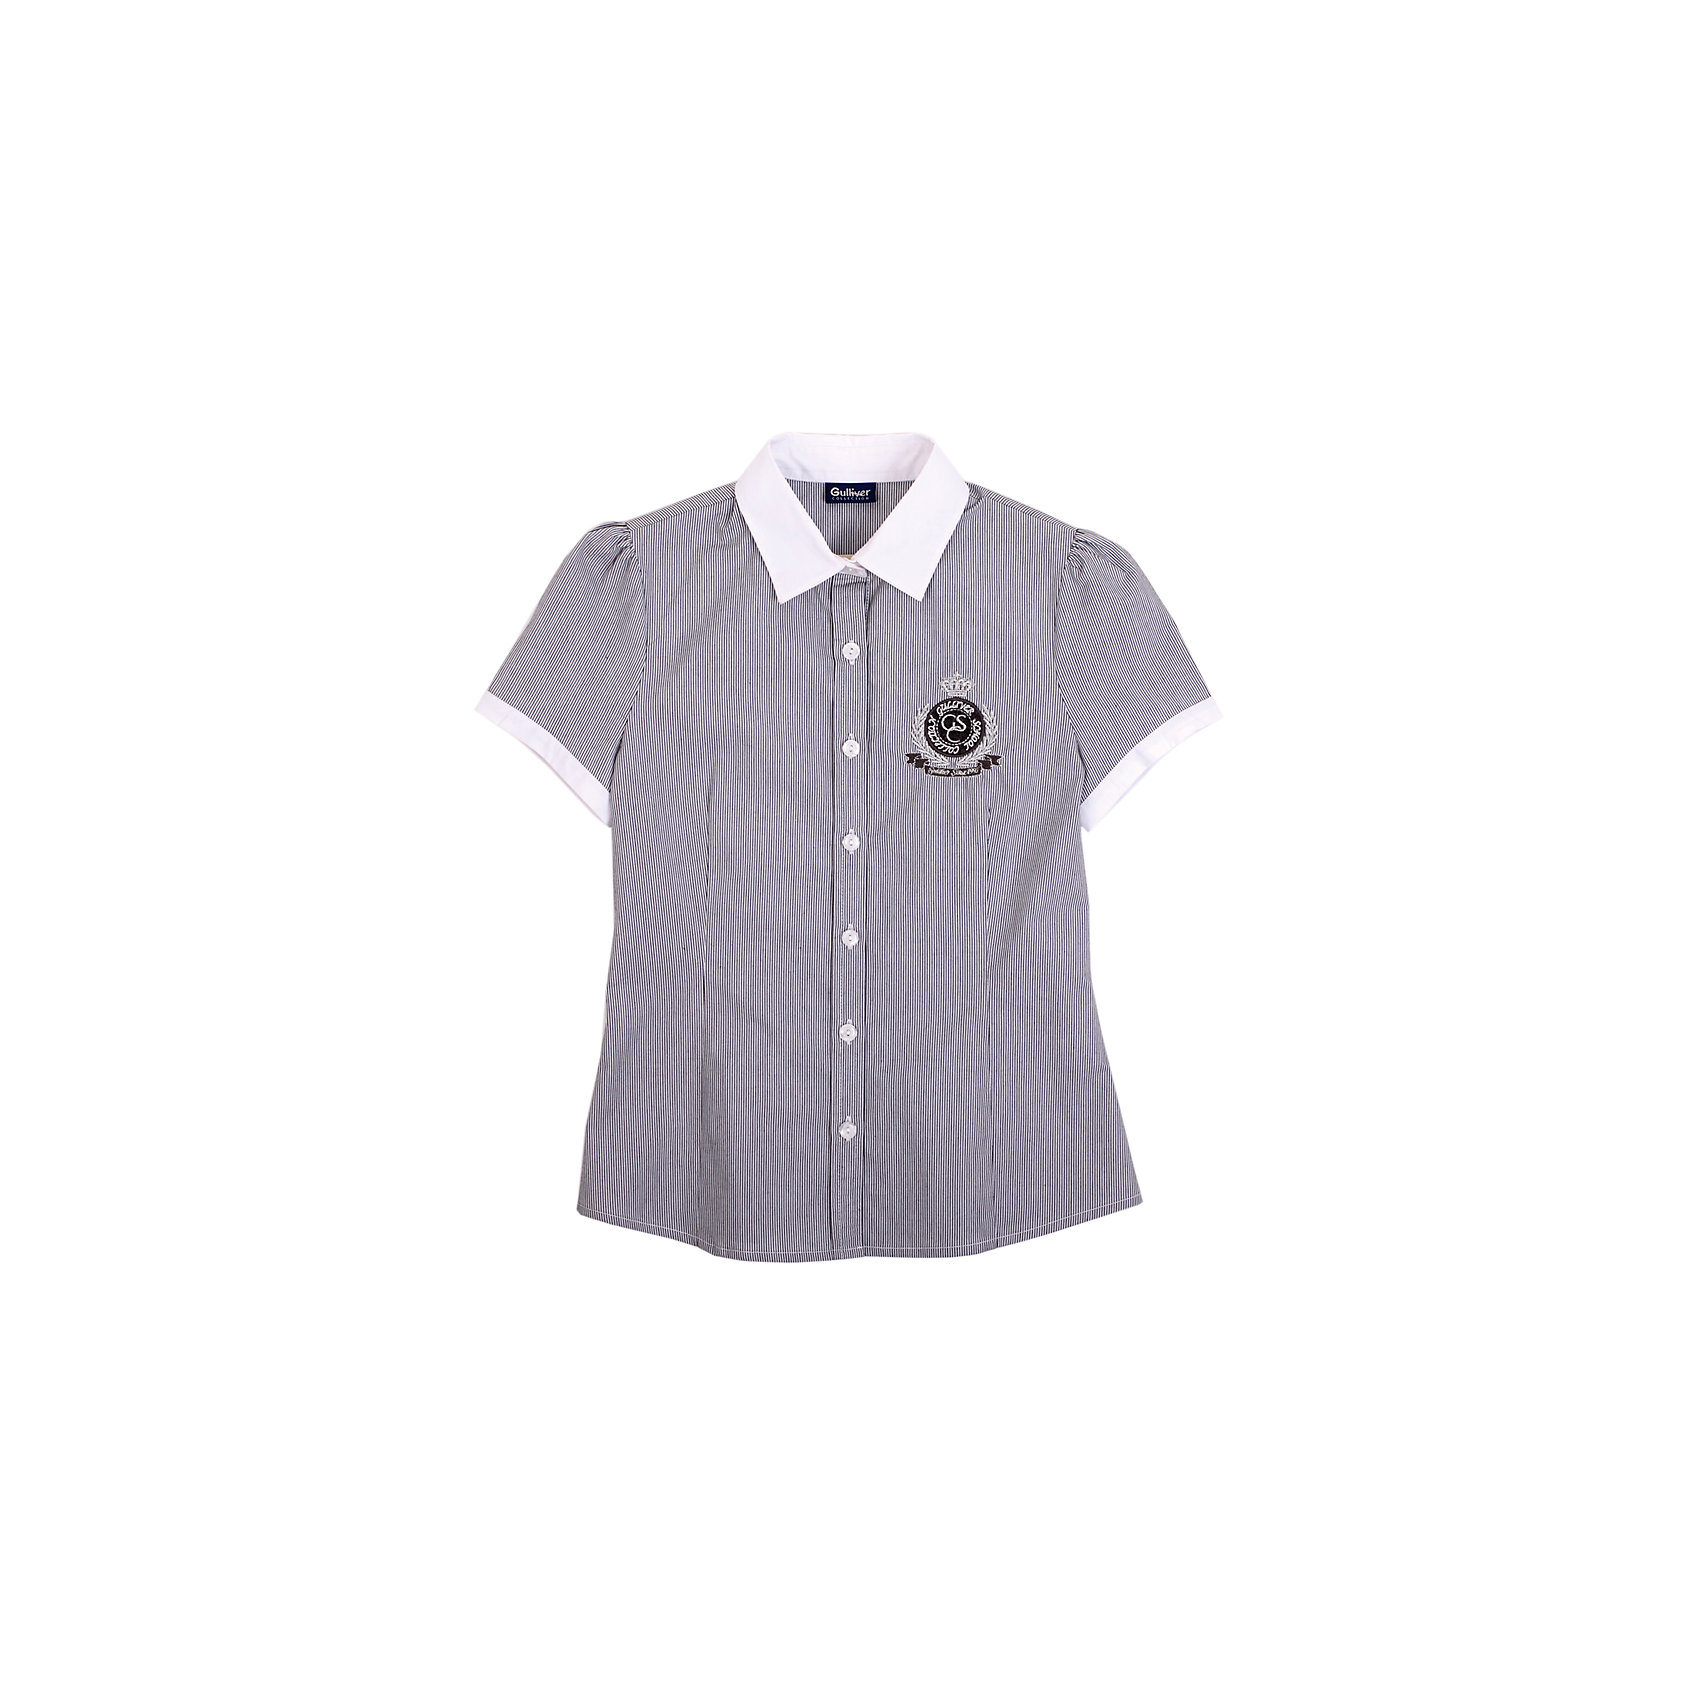 Gulliver Блузка для девочки Gulliver блузка gulliver блузка